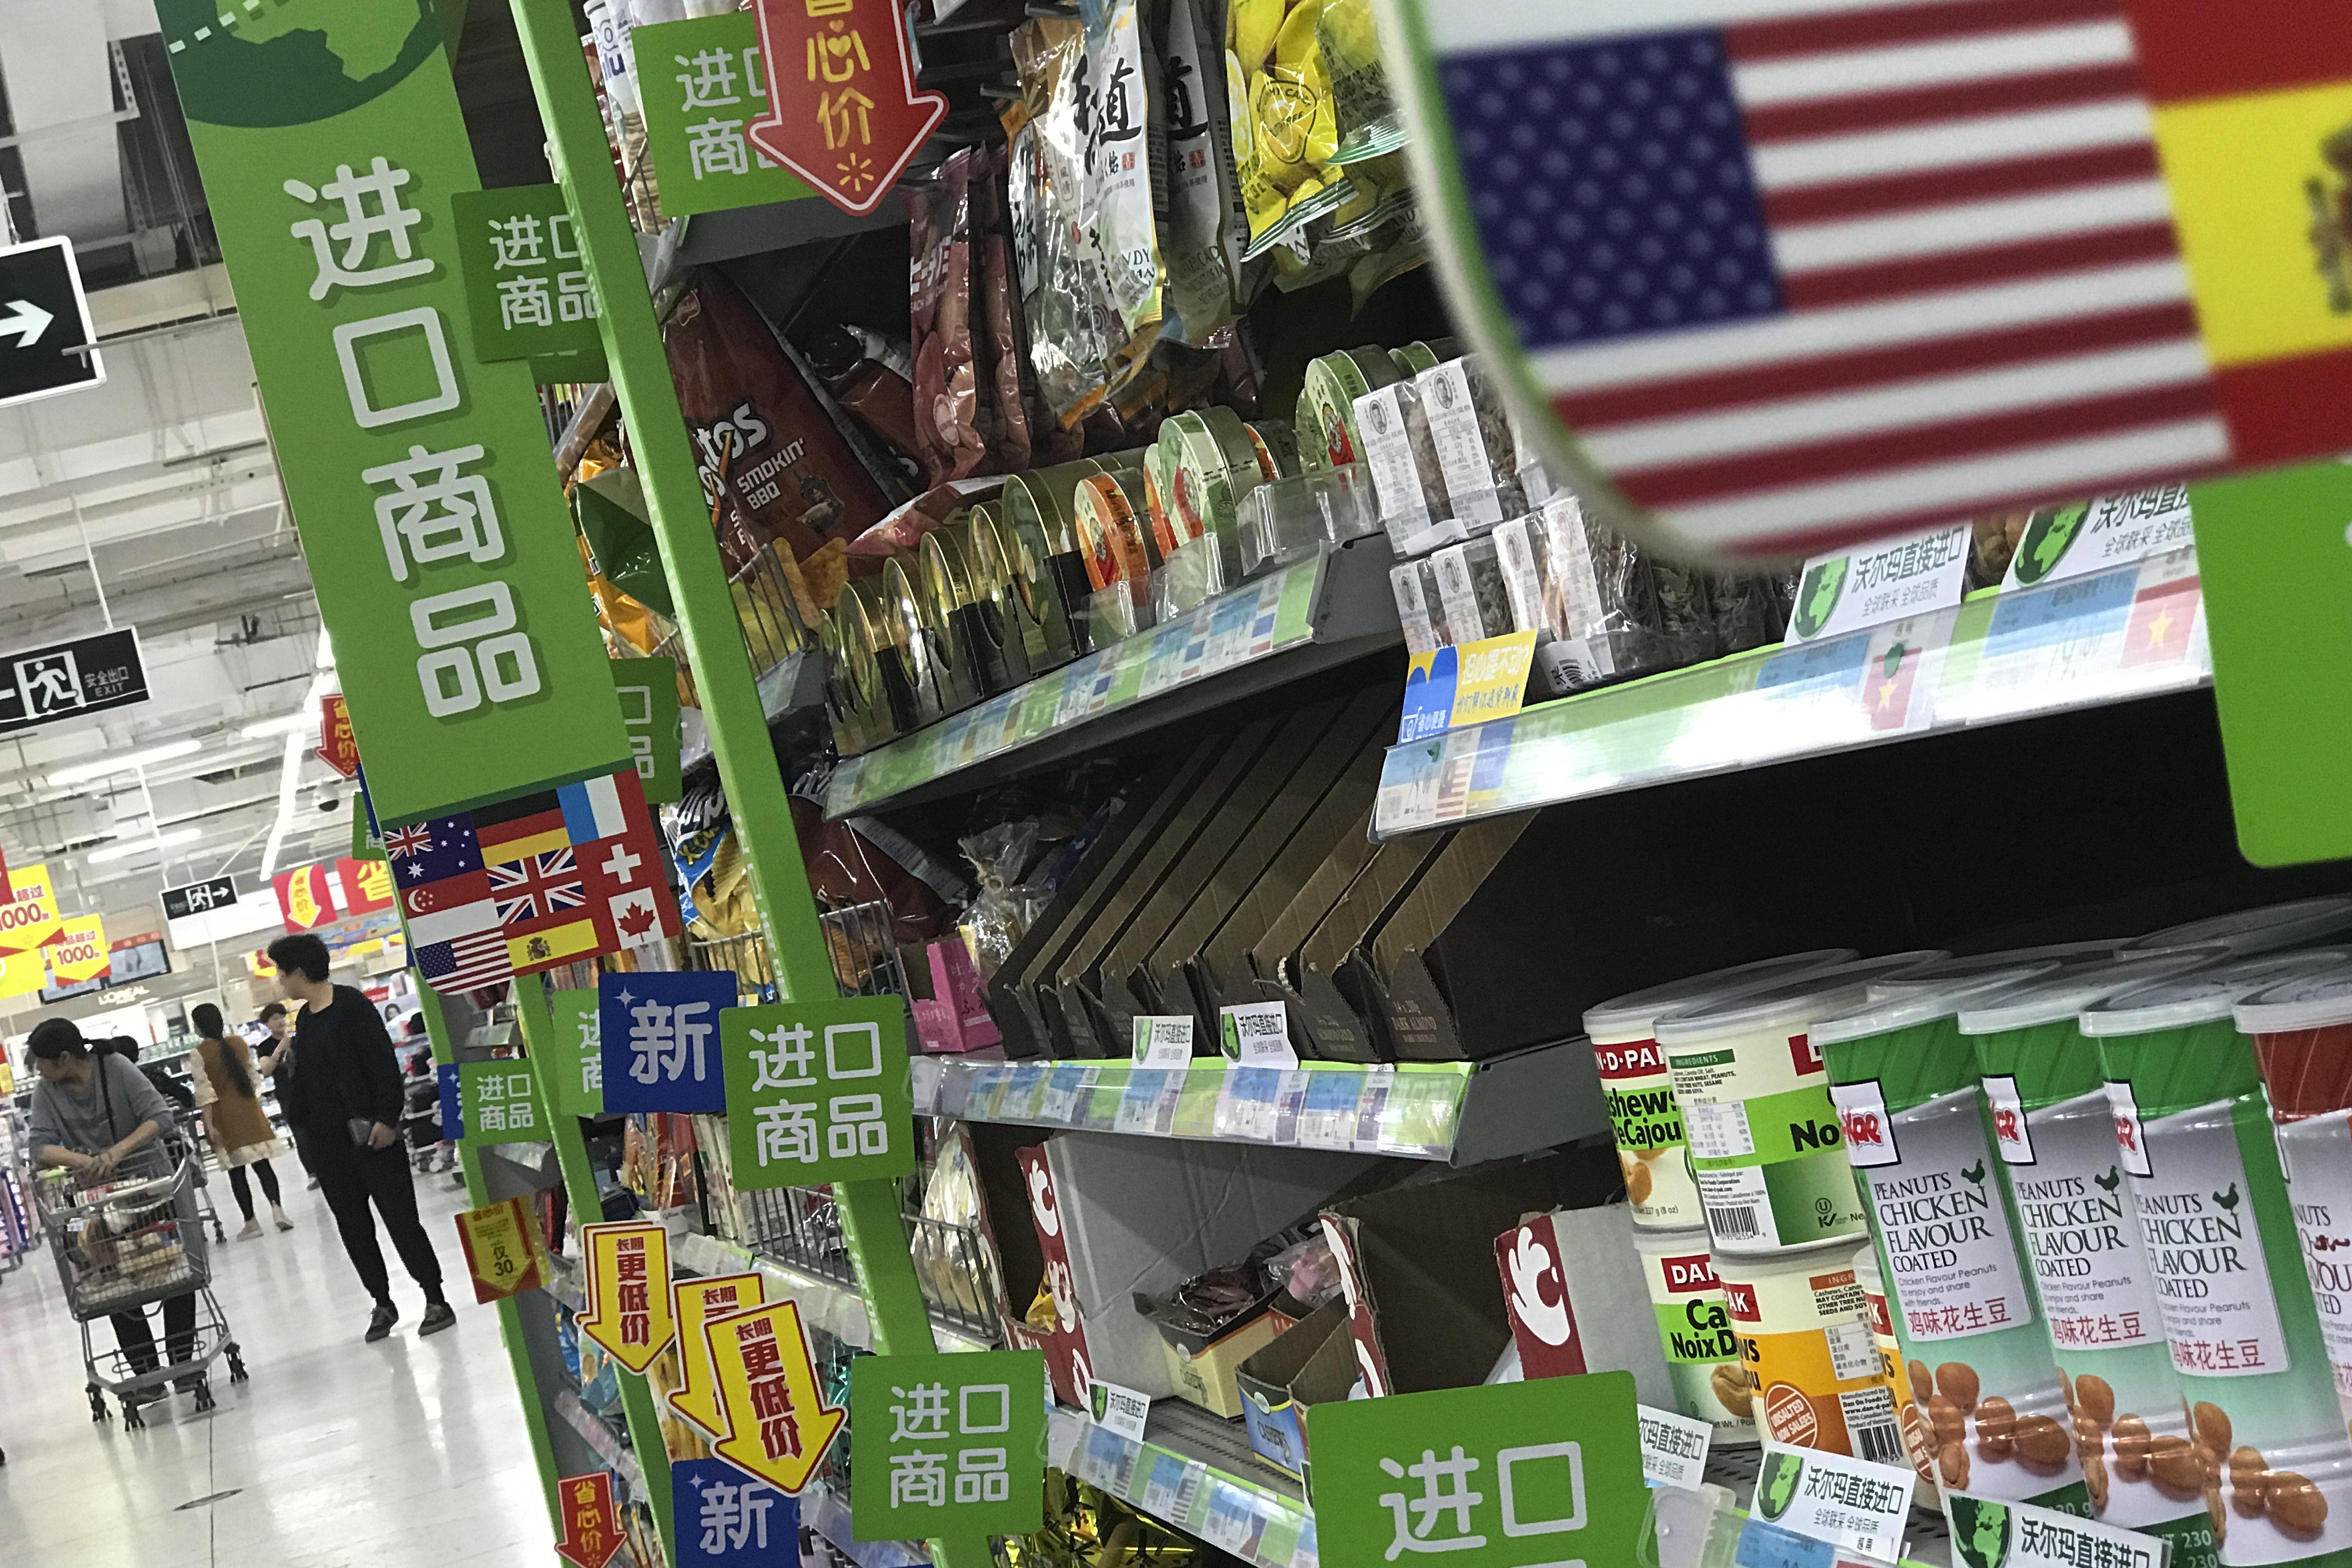 Beijing - China Raises Tariffs On US Food, Fruit In Trade